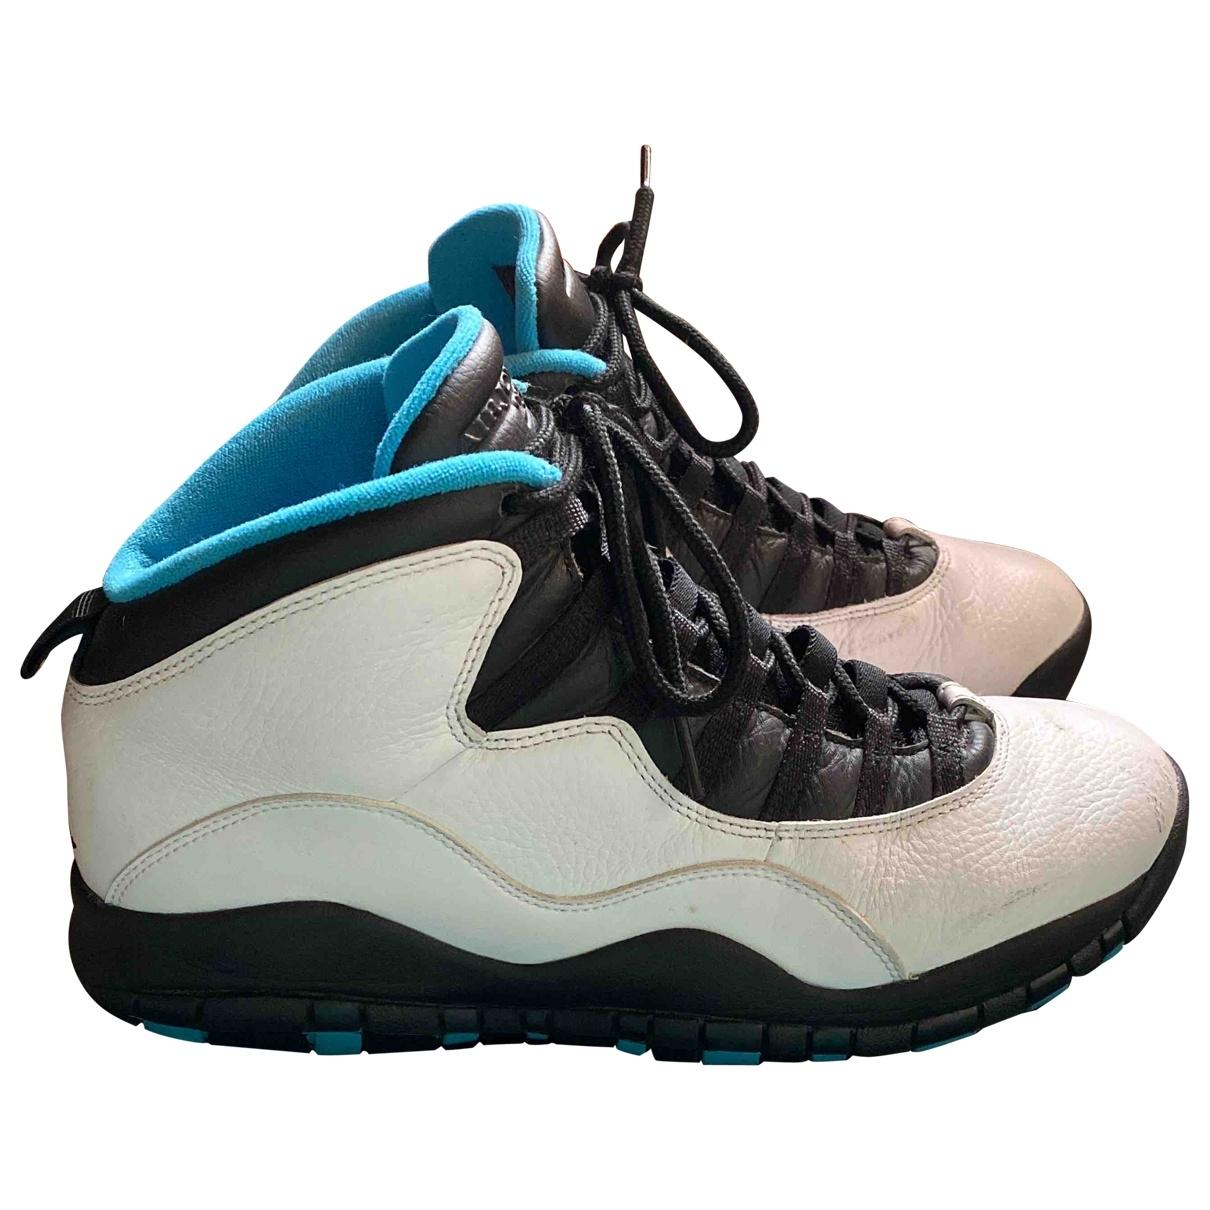 Jordan - Baskets Air Jordan 10 pour homme en cuir - blanc